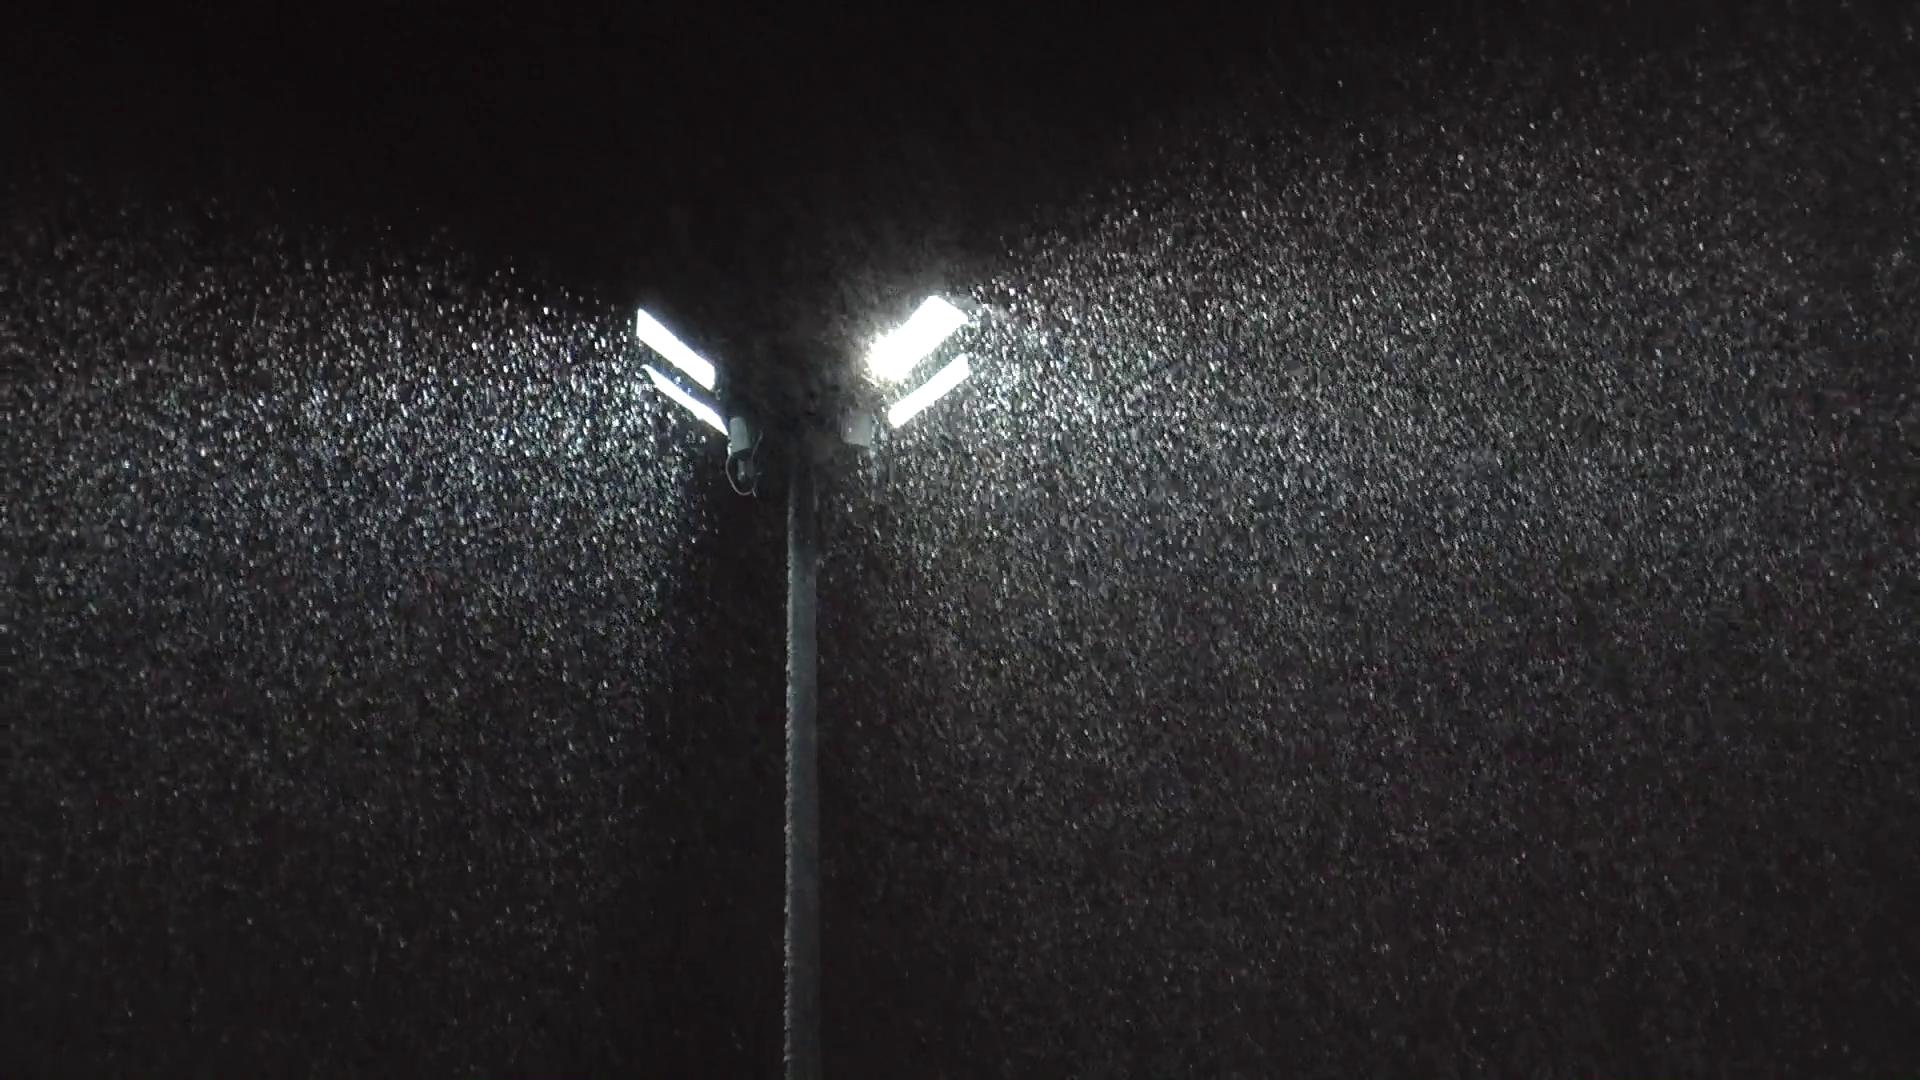 high-street-lamp-illuminates-the-falling-snow-dark-winter-night_hen-iw9zg_thumbnail-full01